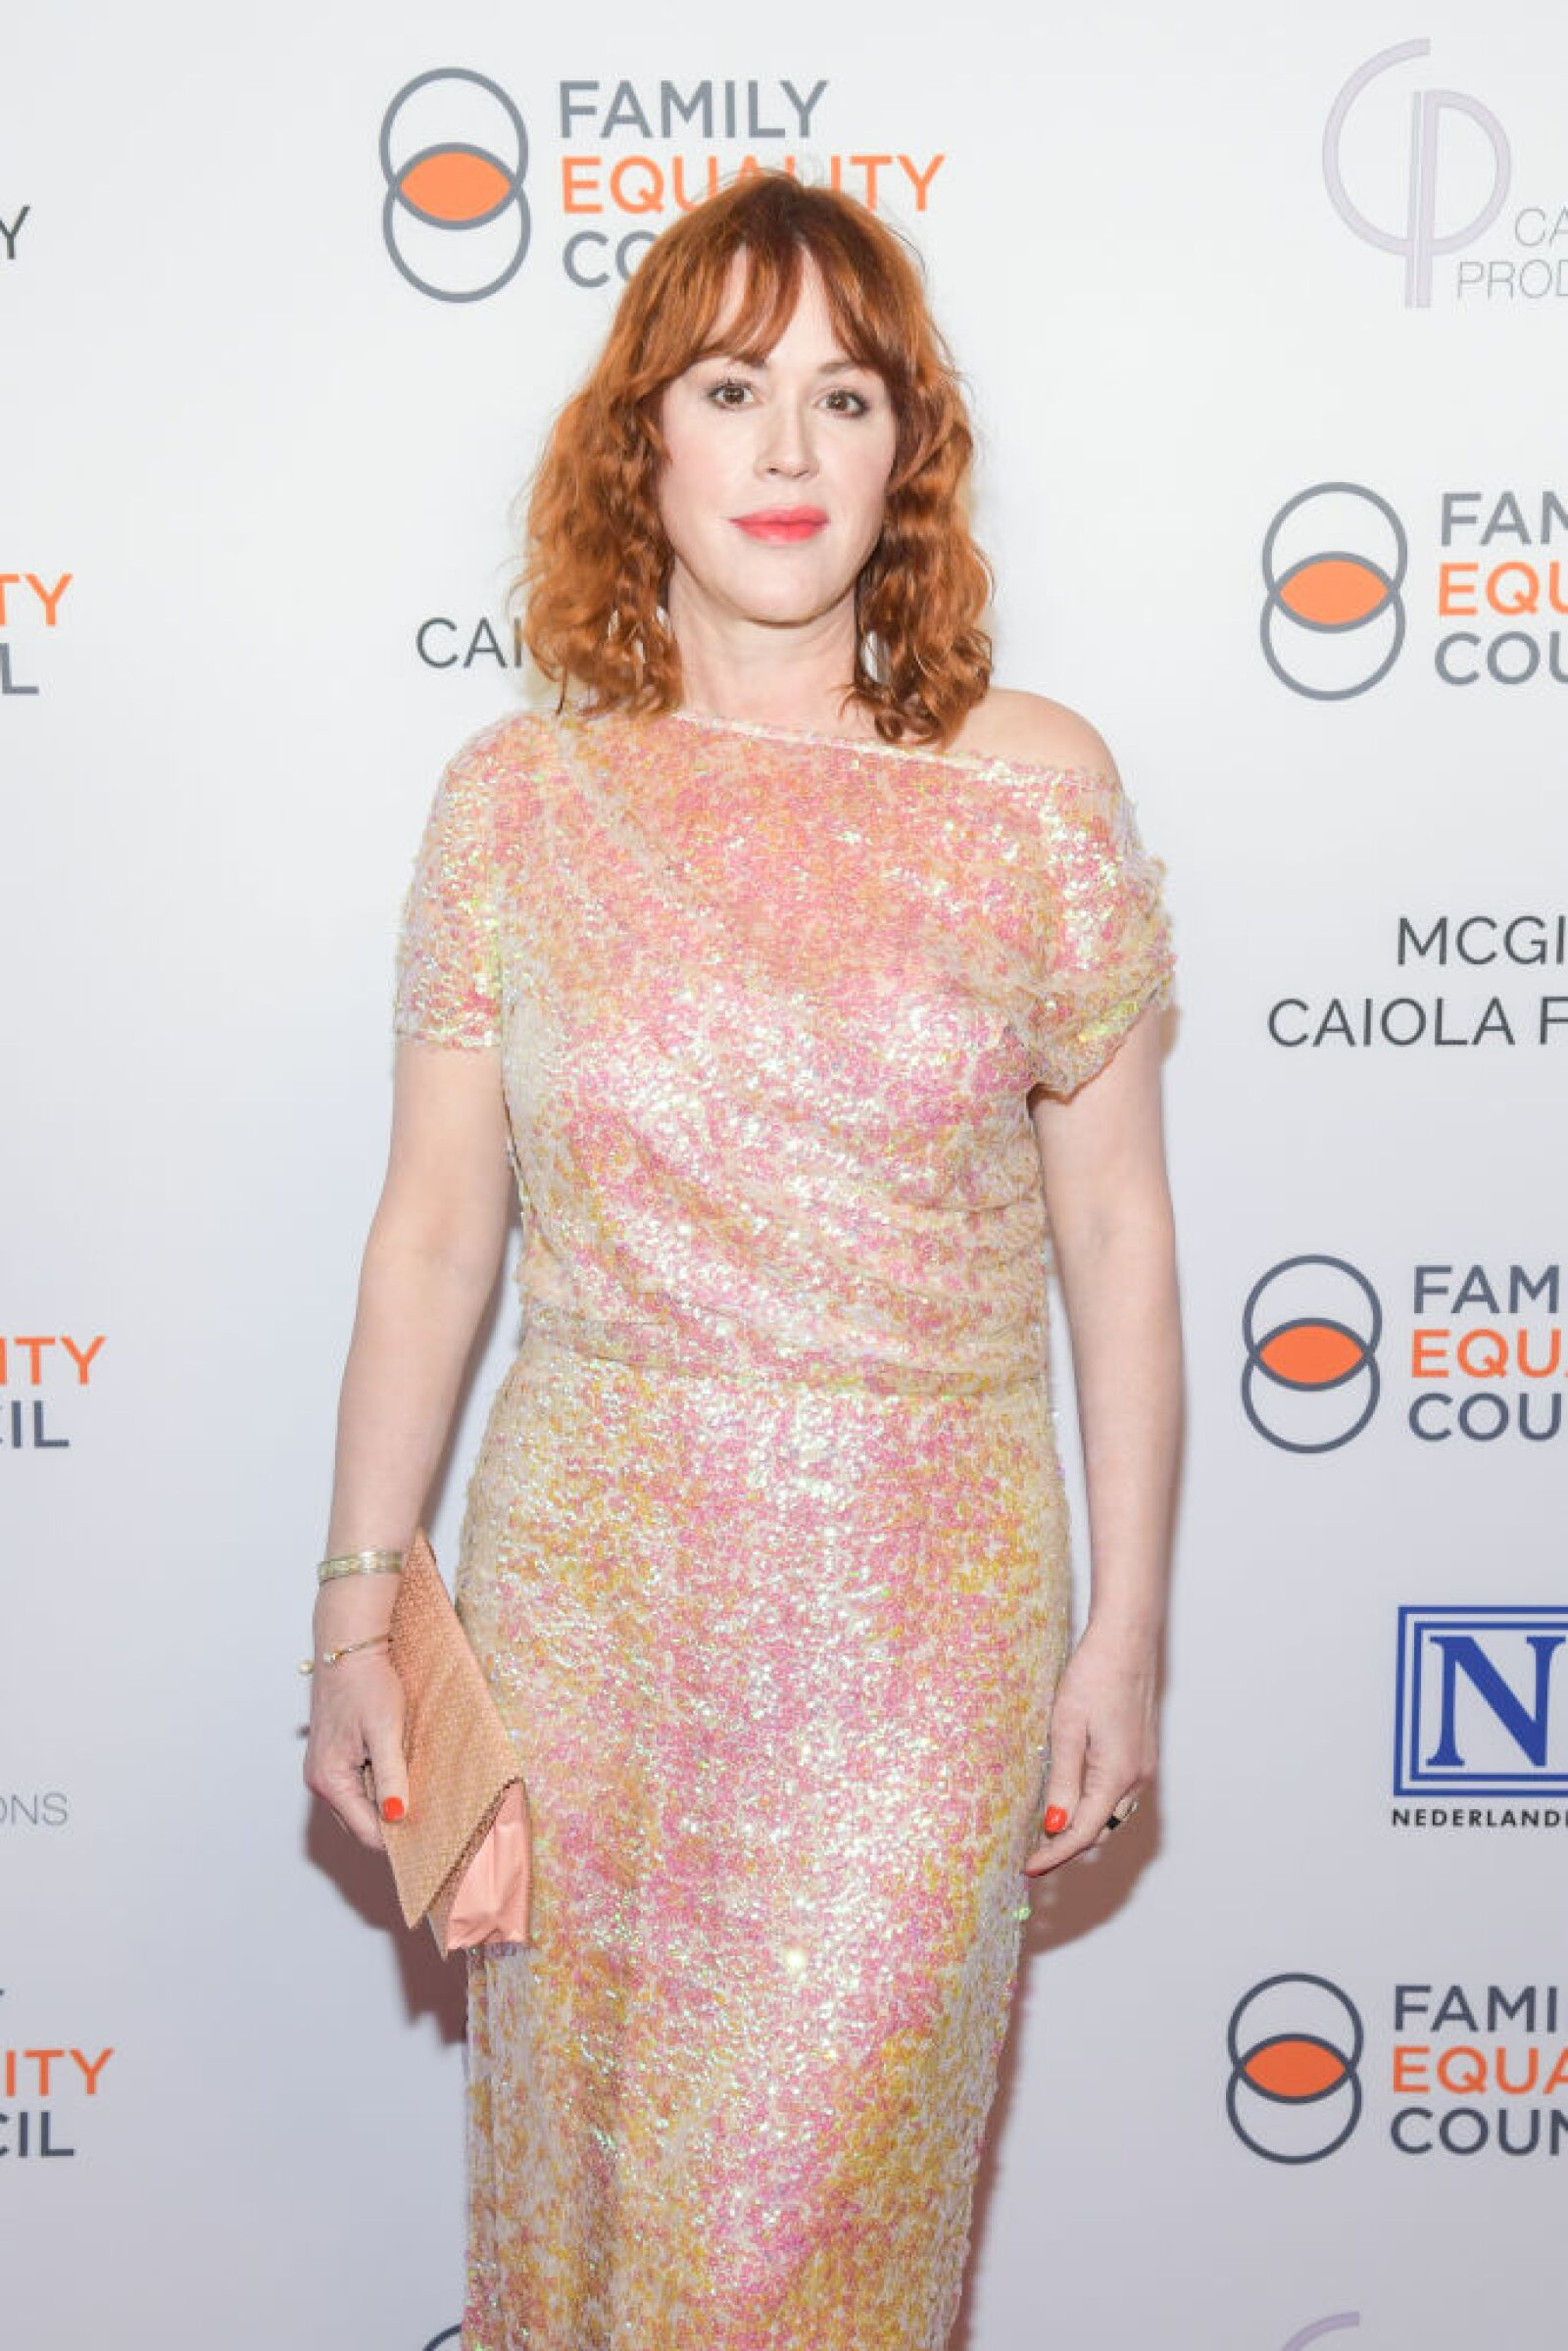 Molly Ringwald de 52 años interpreta a Sara Flynn en The Kissing Booth